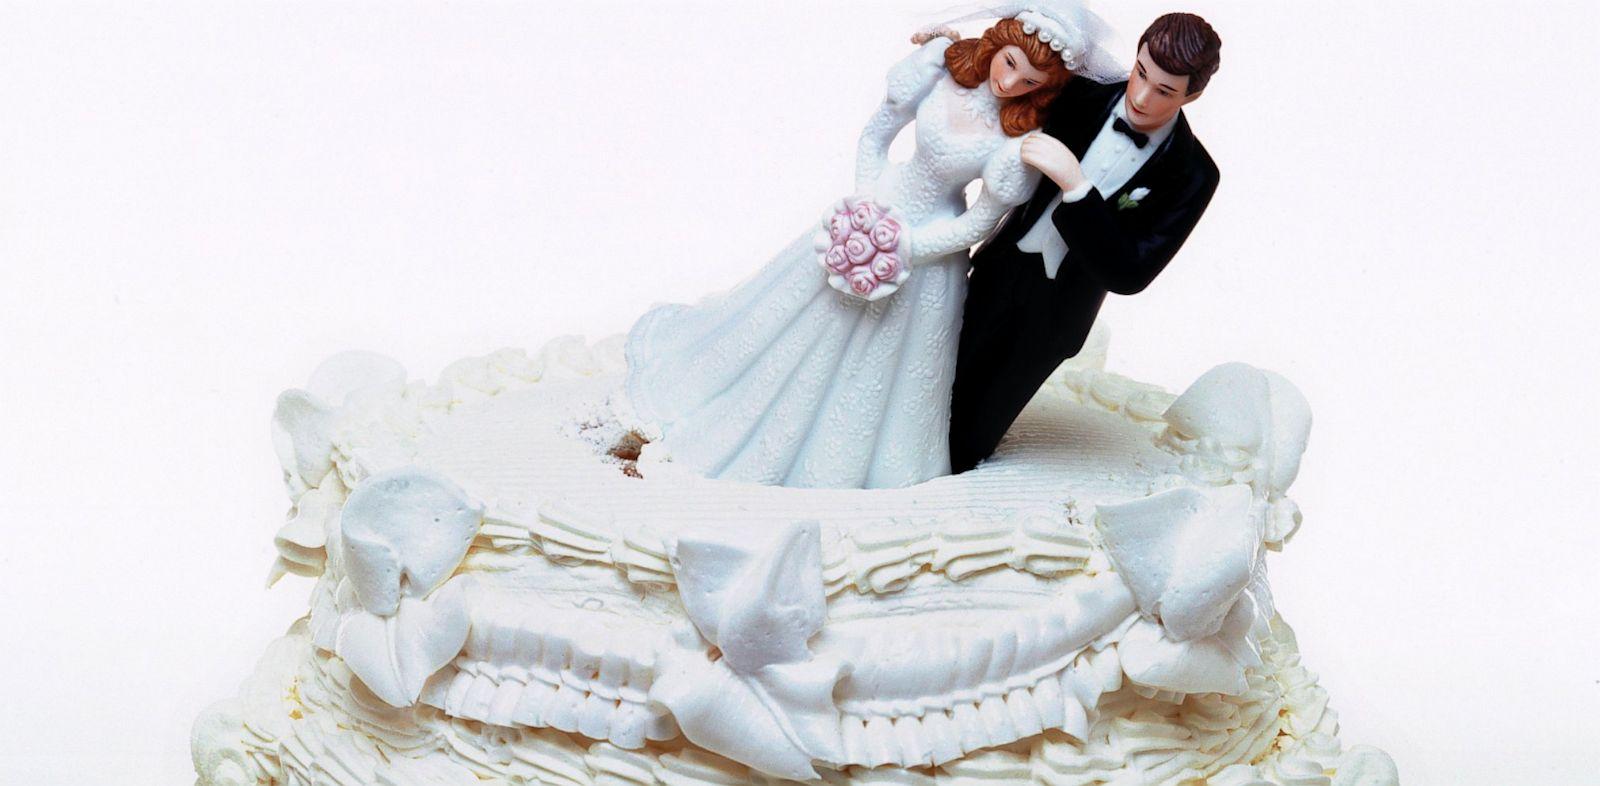 PHOTO: budget impasse impacting countless weddings